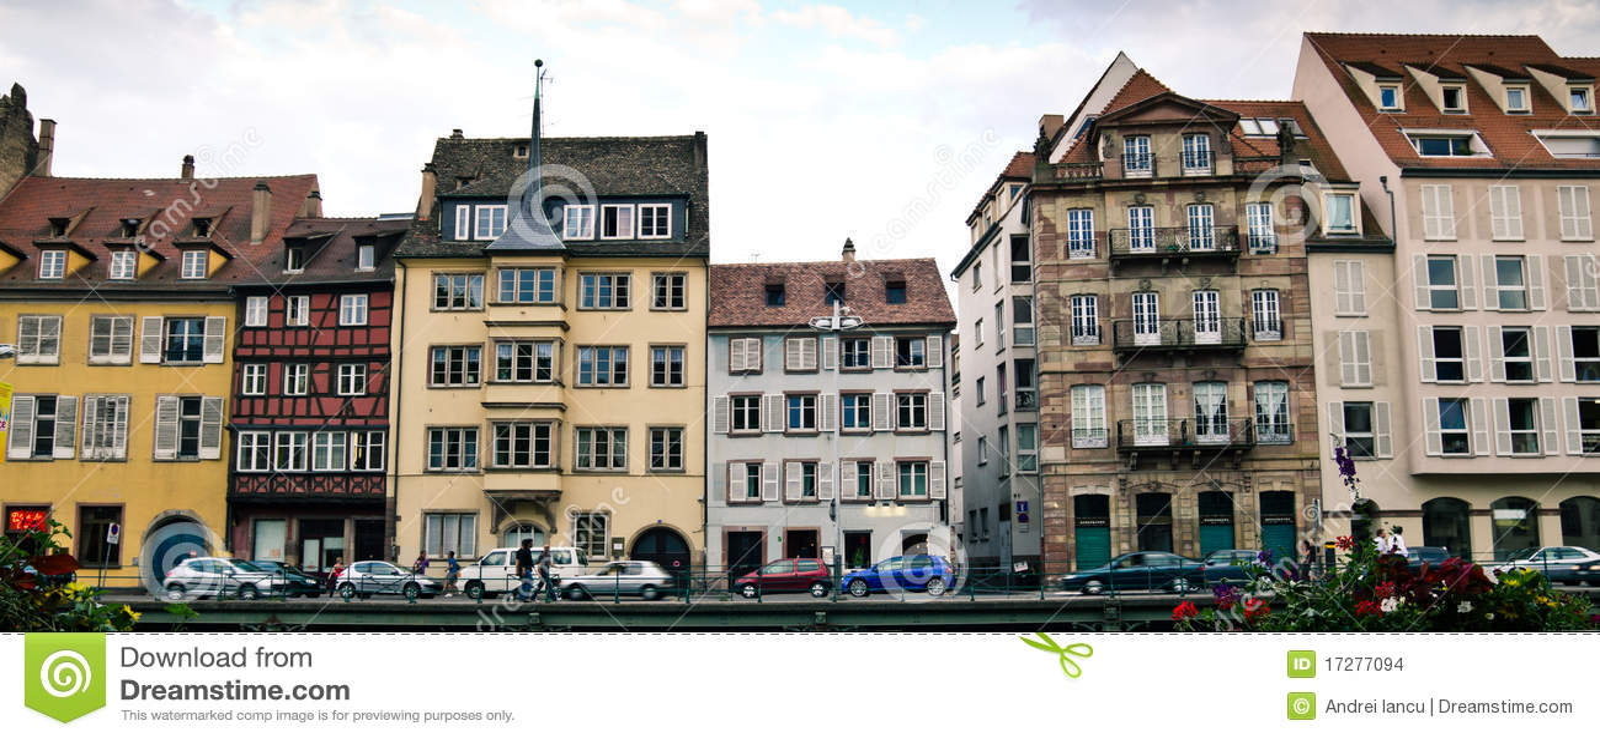 strasbourg street stock photo image of architecture 17277094. Black Bedroom Furniture Sets. Home Design Ideas